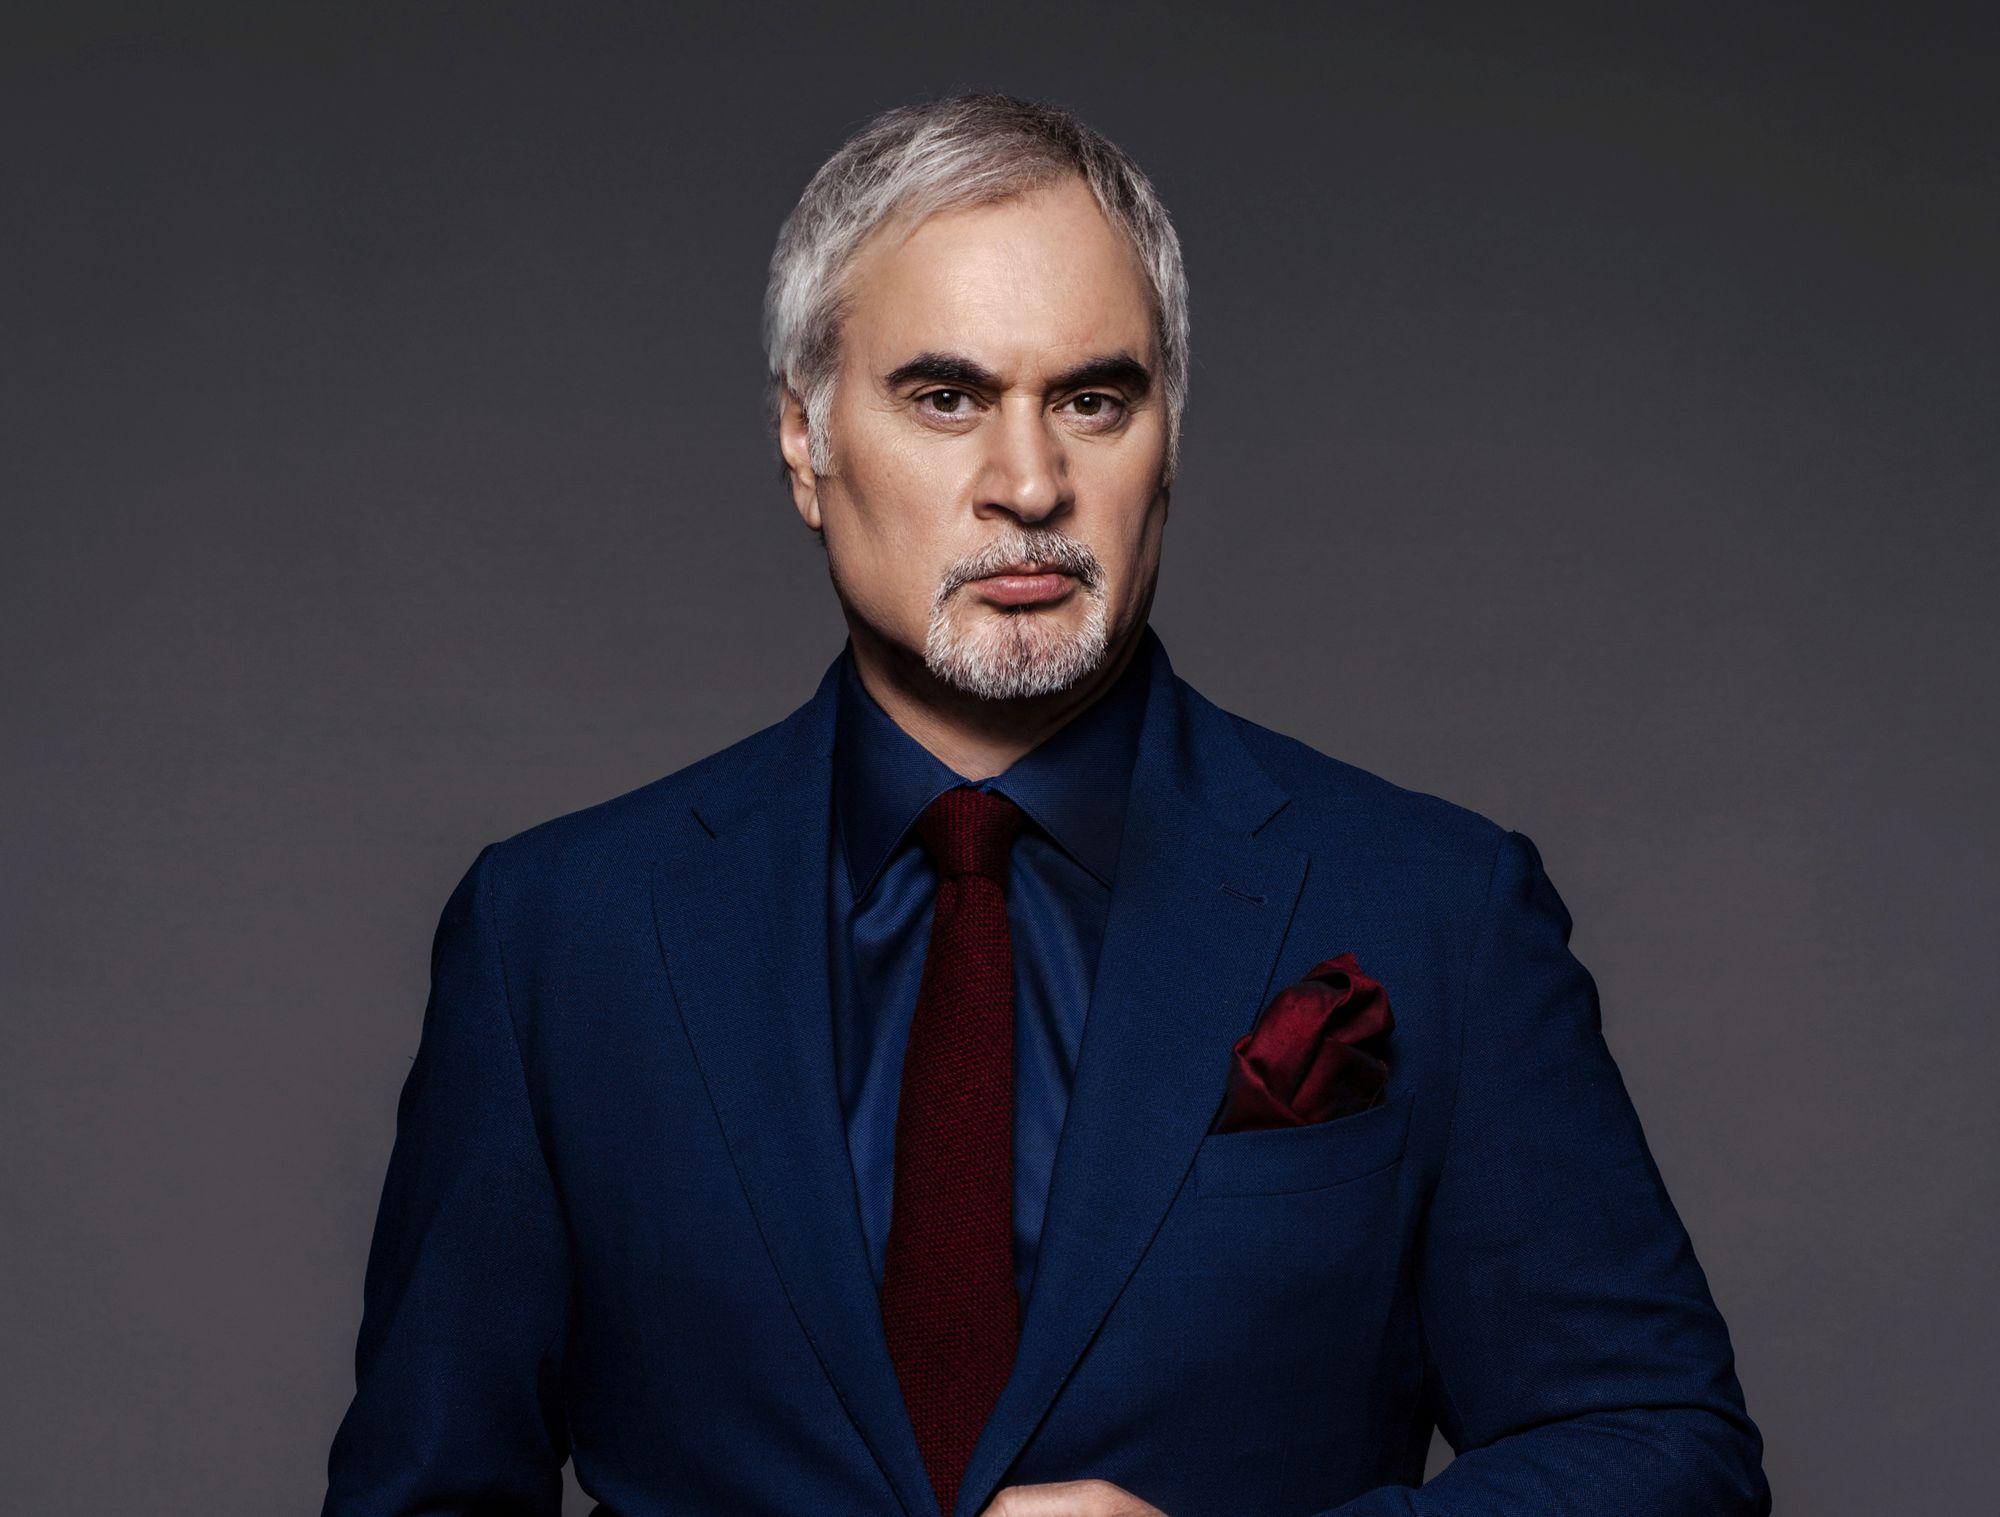 Меладзе, певец